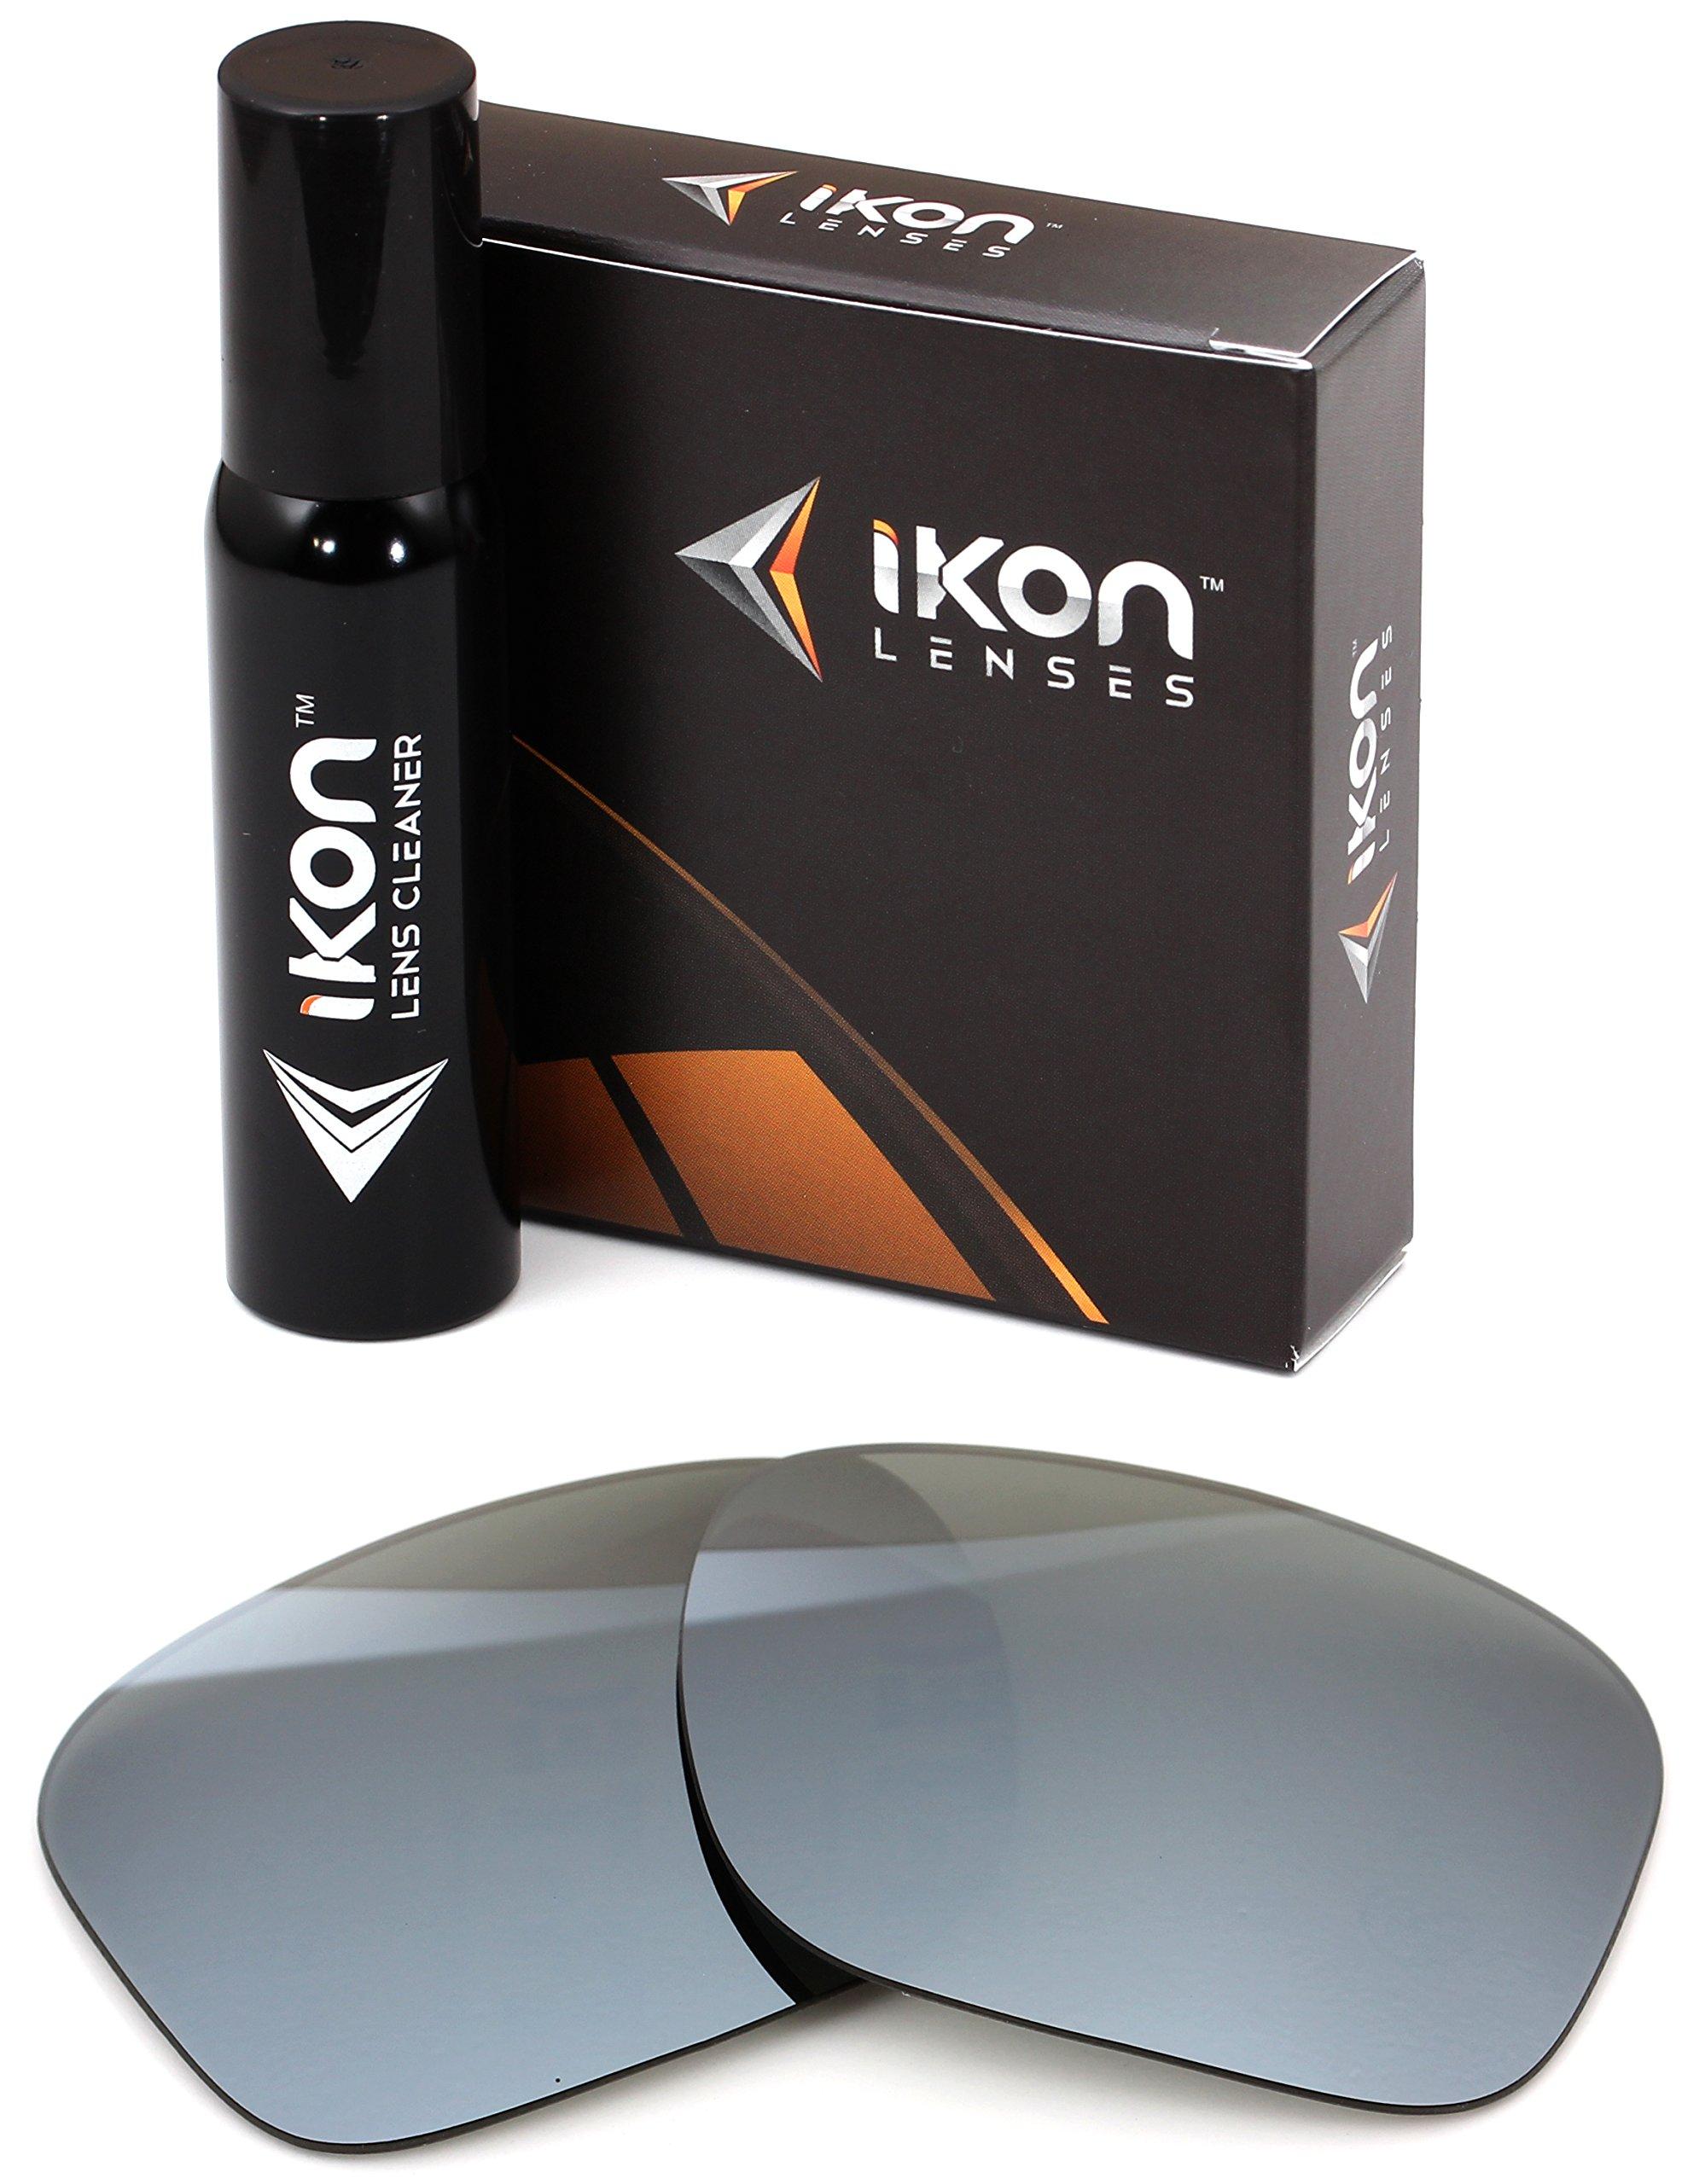 Polarized IKON Replacement Lenses for Von Zipper Lomax Sunglasses - Silver